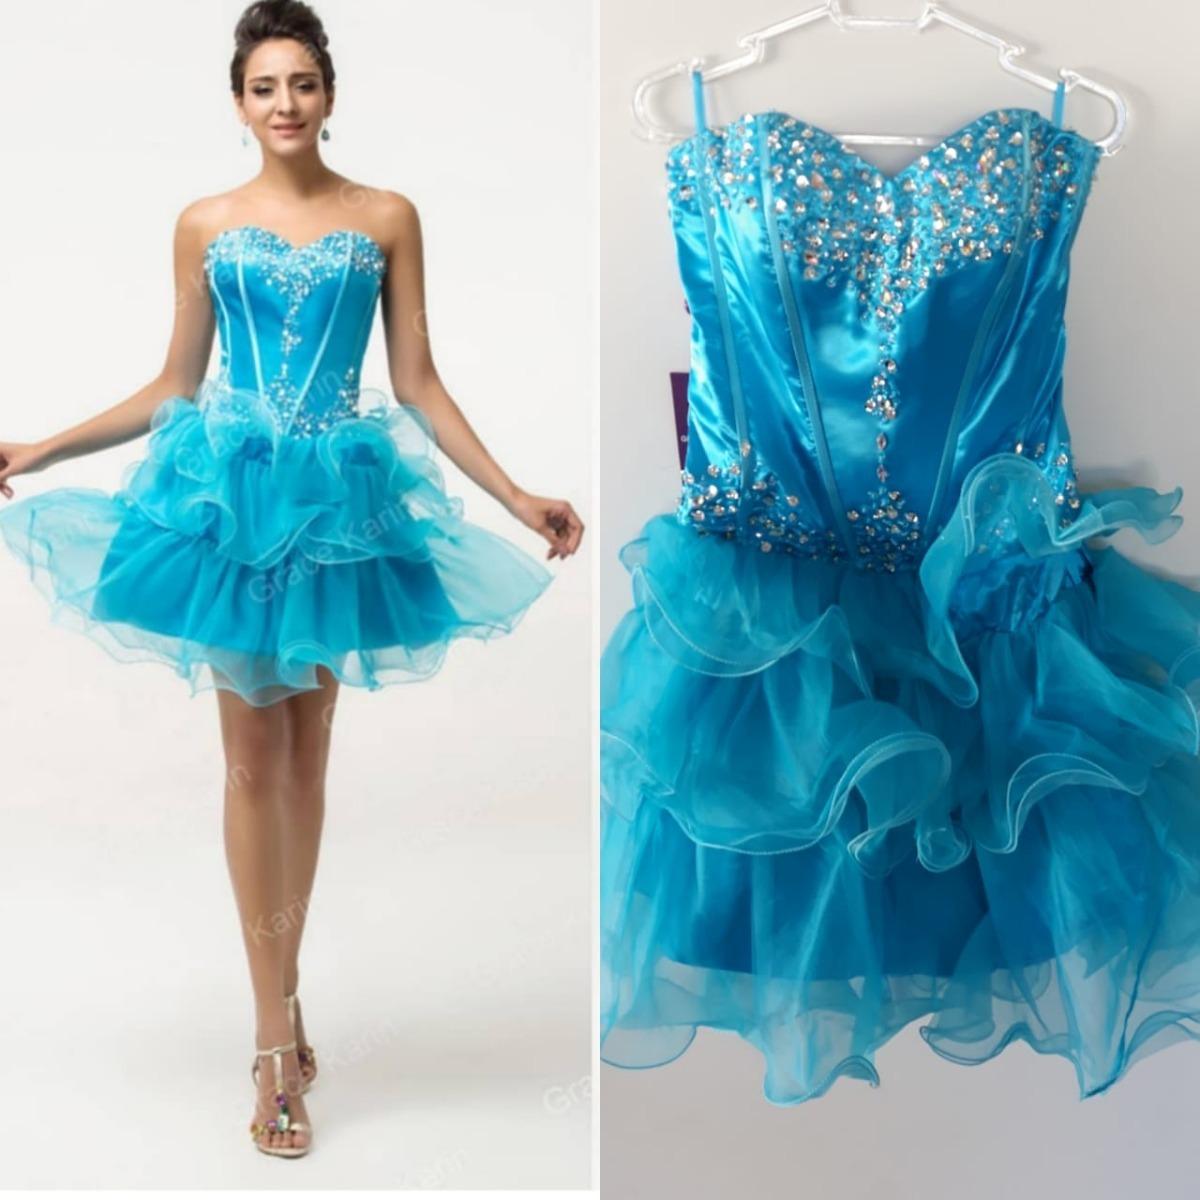 Vestido de festa azul curto rodado